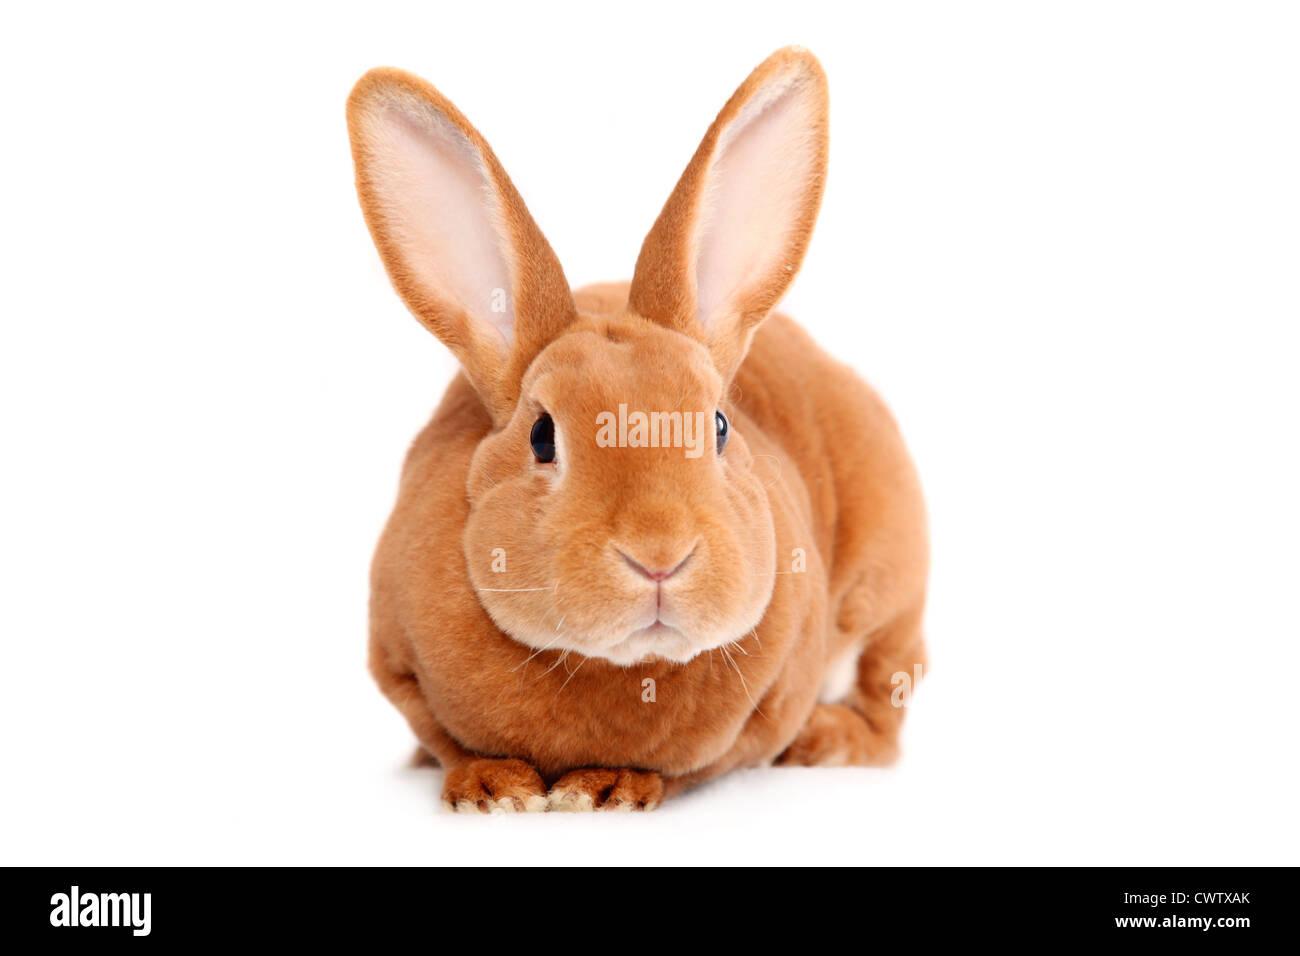 Kleinrex / Rex Bunny Photo Stock